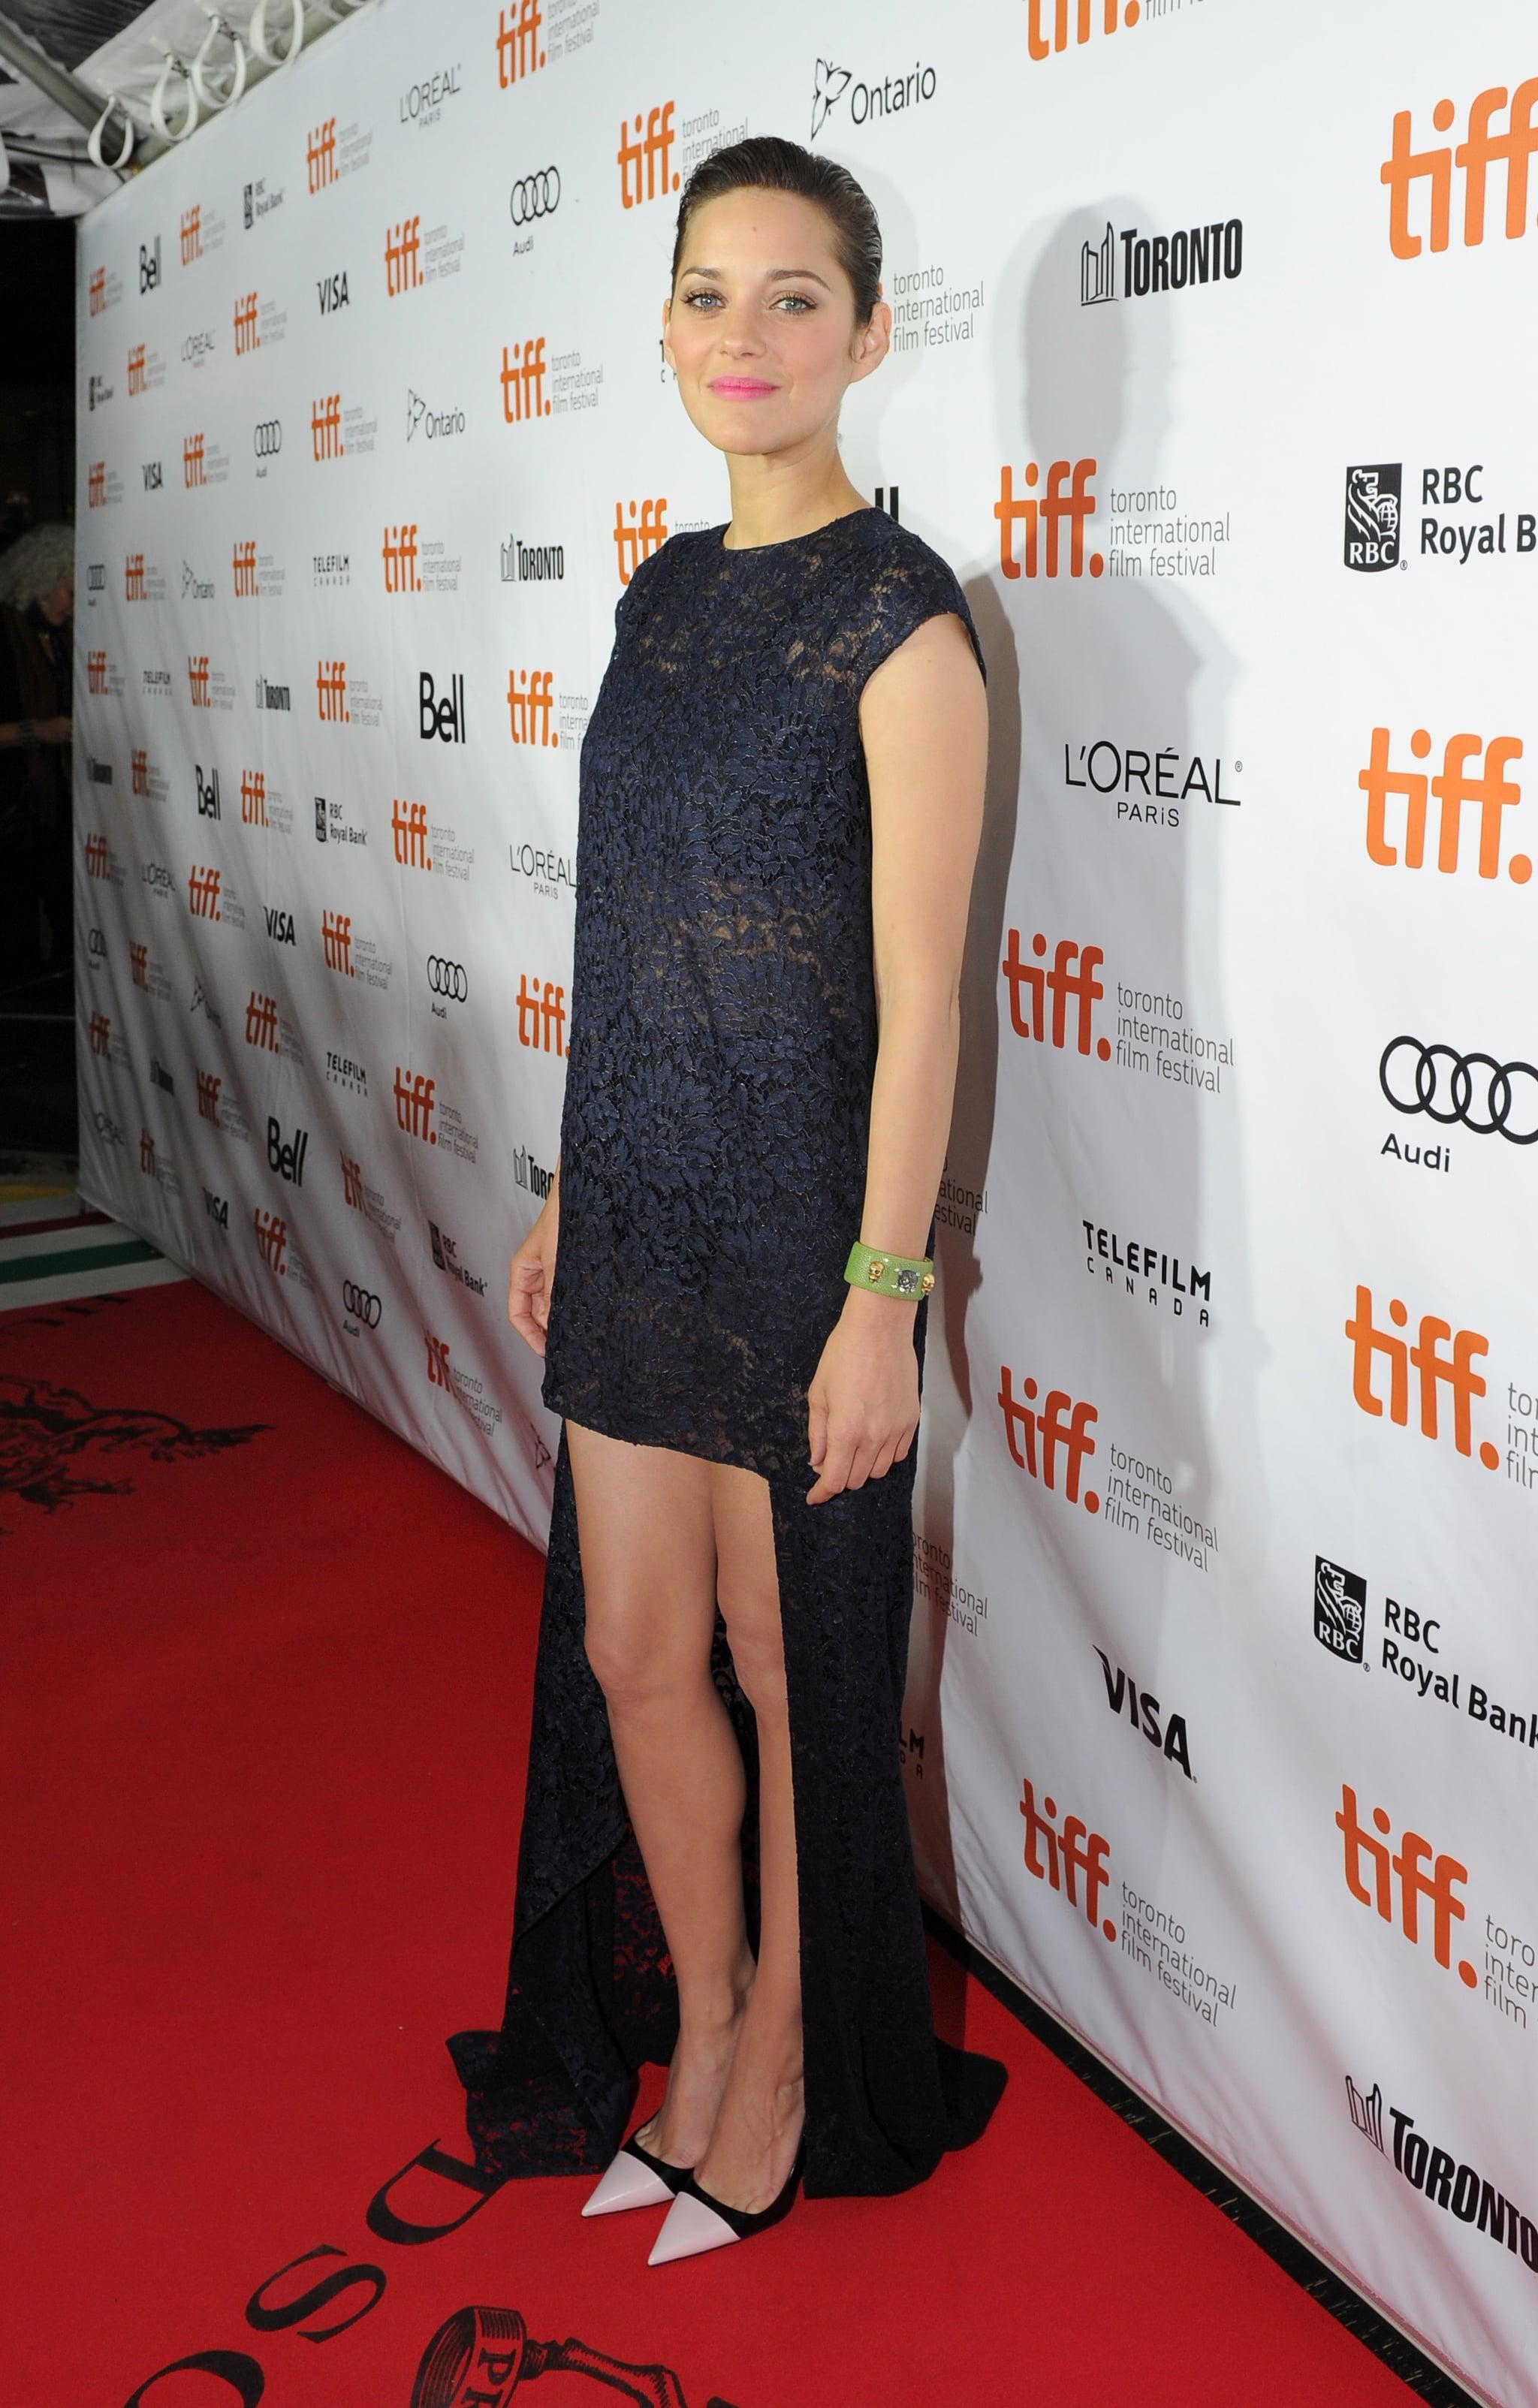 Marion Cotillard showed a little leg at the Blood Ties premiere.